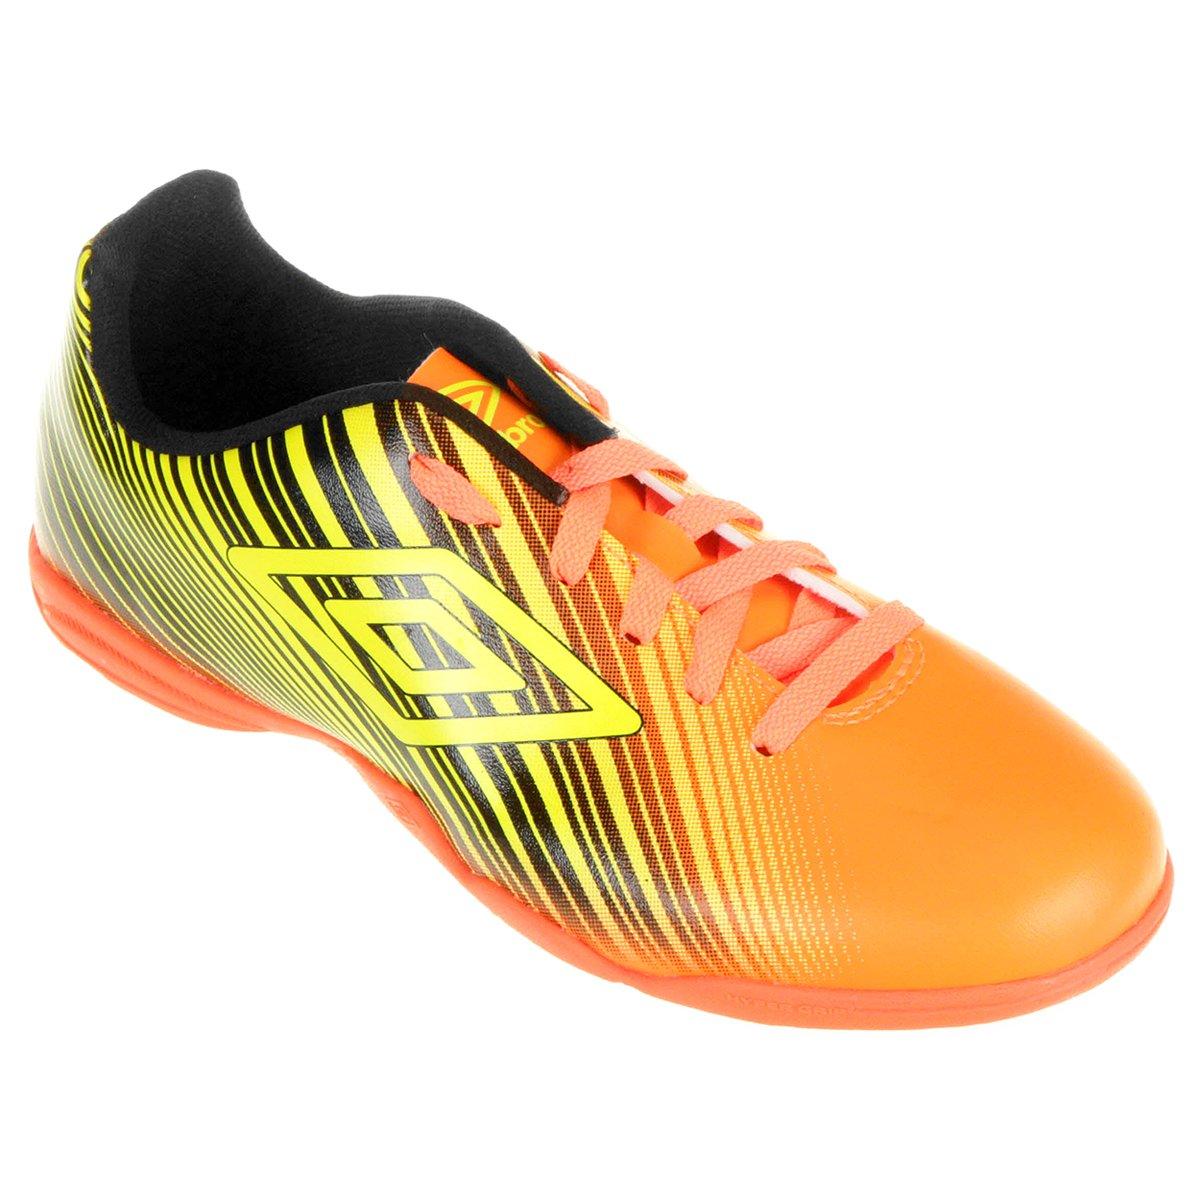 c1d50ceff Chuteira Futsal Umbro Slice II Masculina